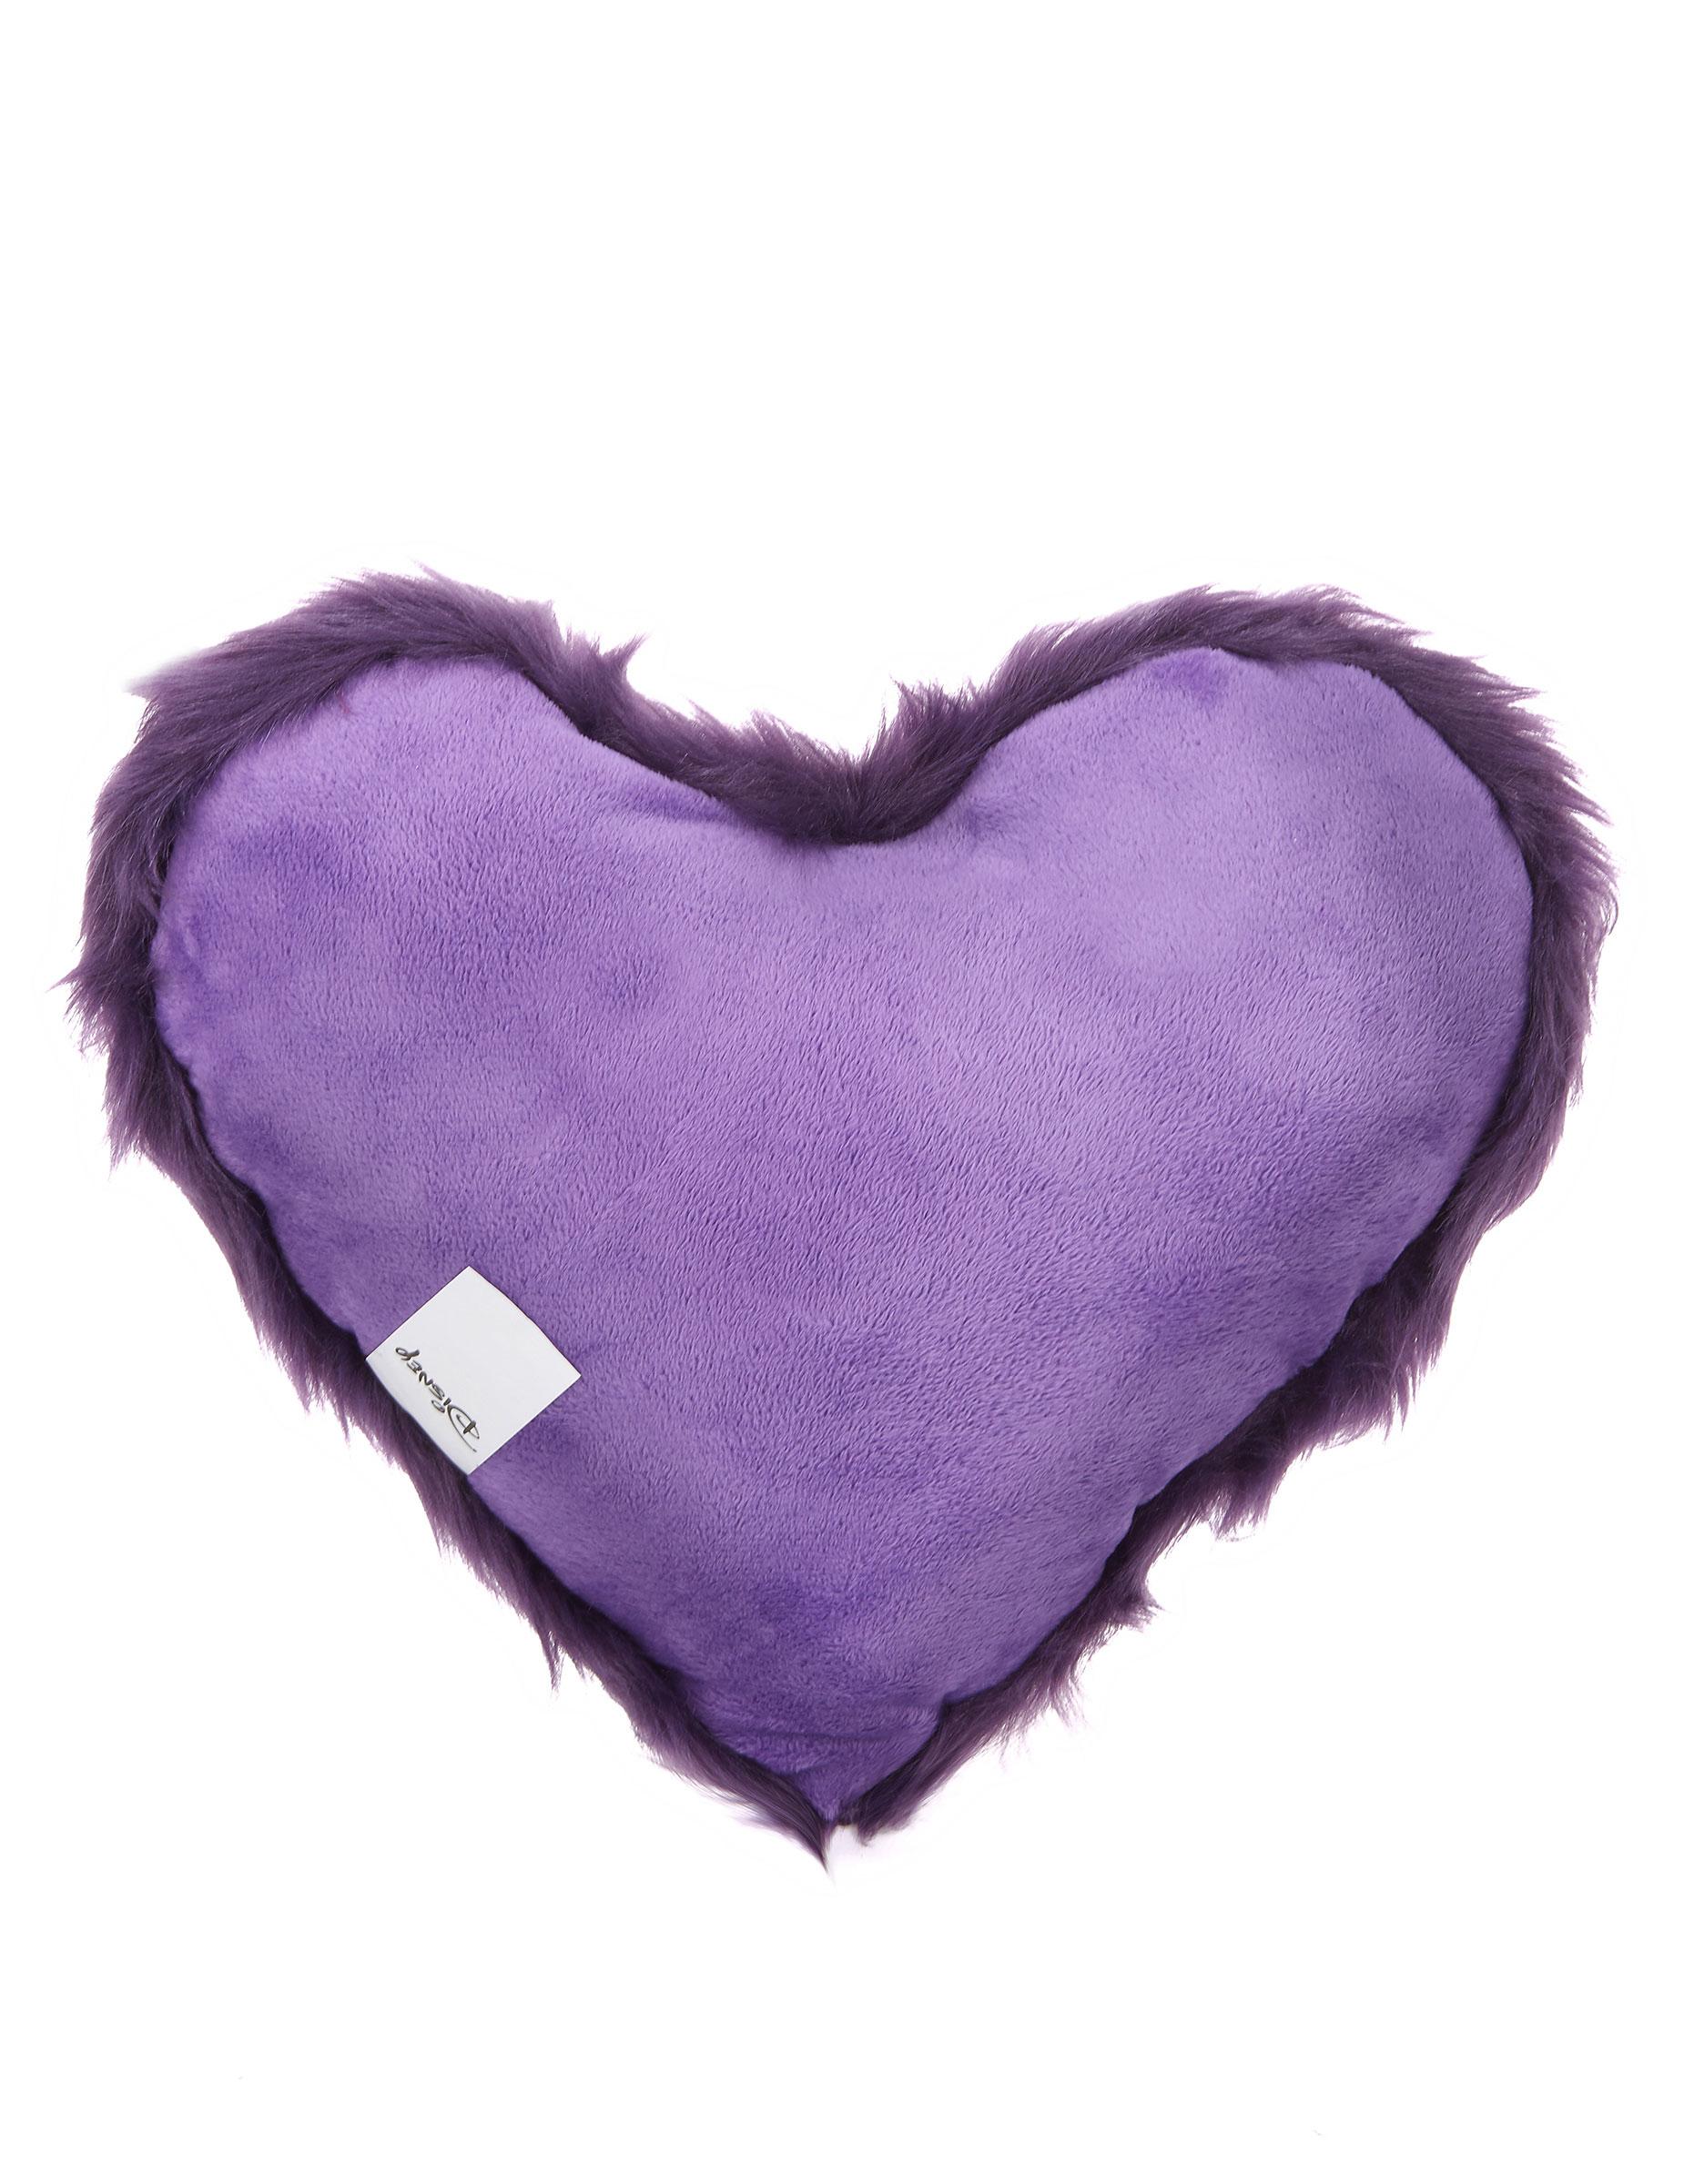 disney violetta kissen herzform lizenzware bunt 36x32cm g nstige faschings accessoires. Black Bedroom Furniture Sets. Home Design Ideas